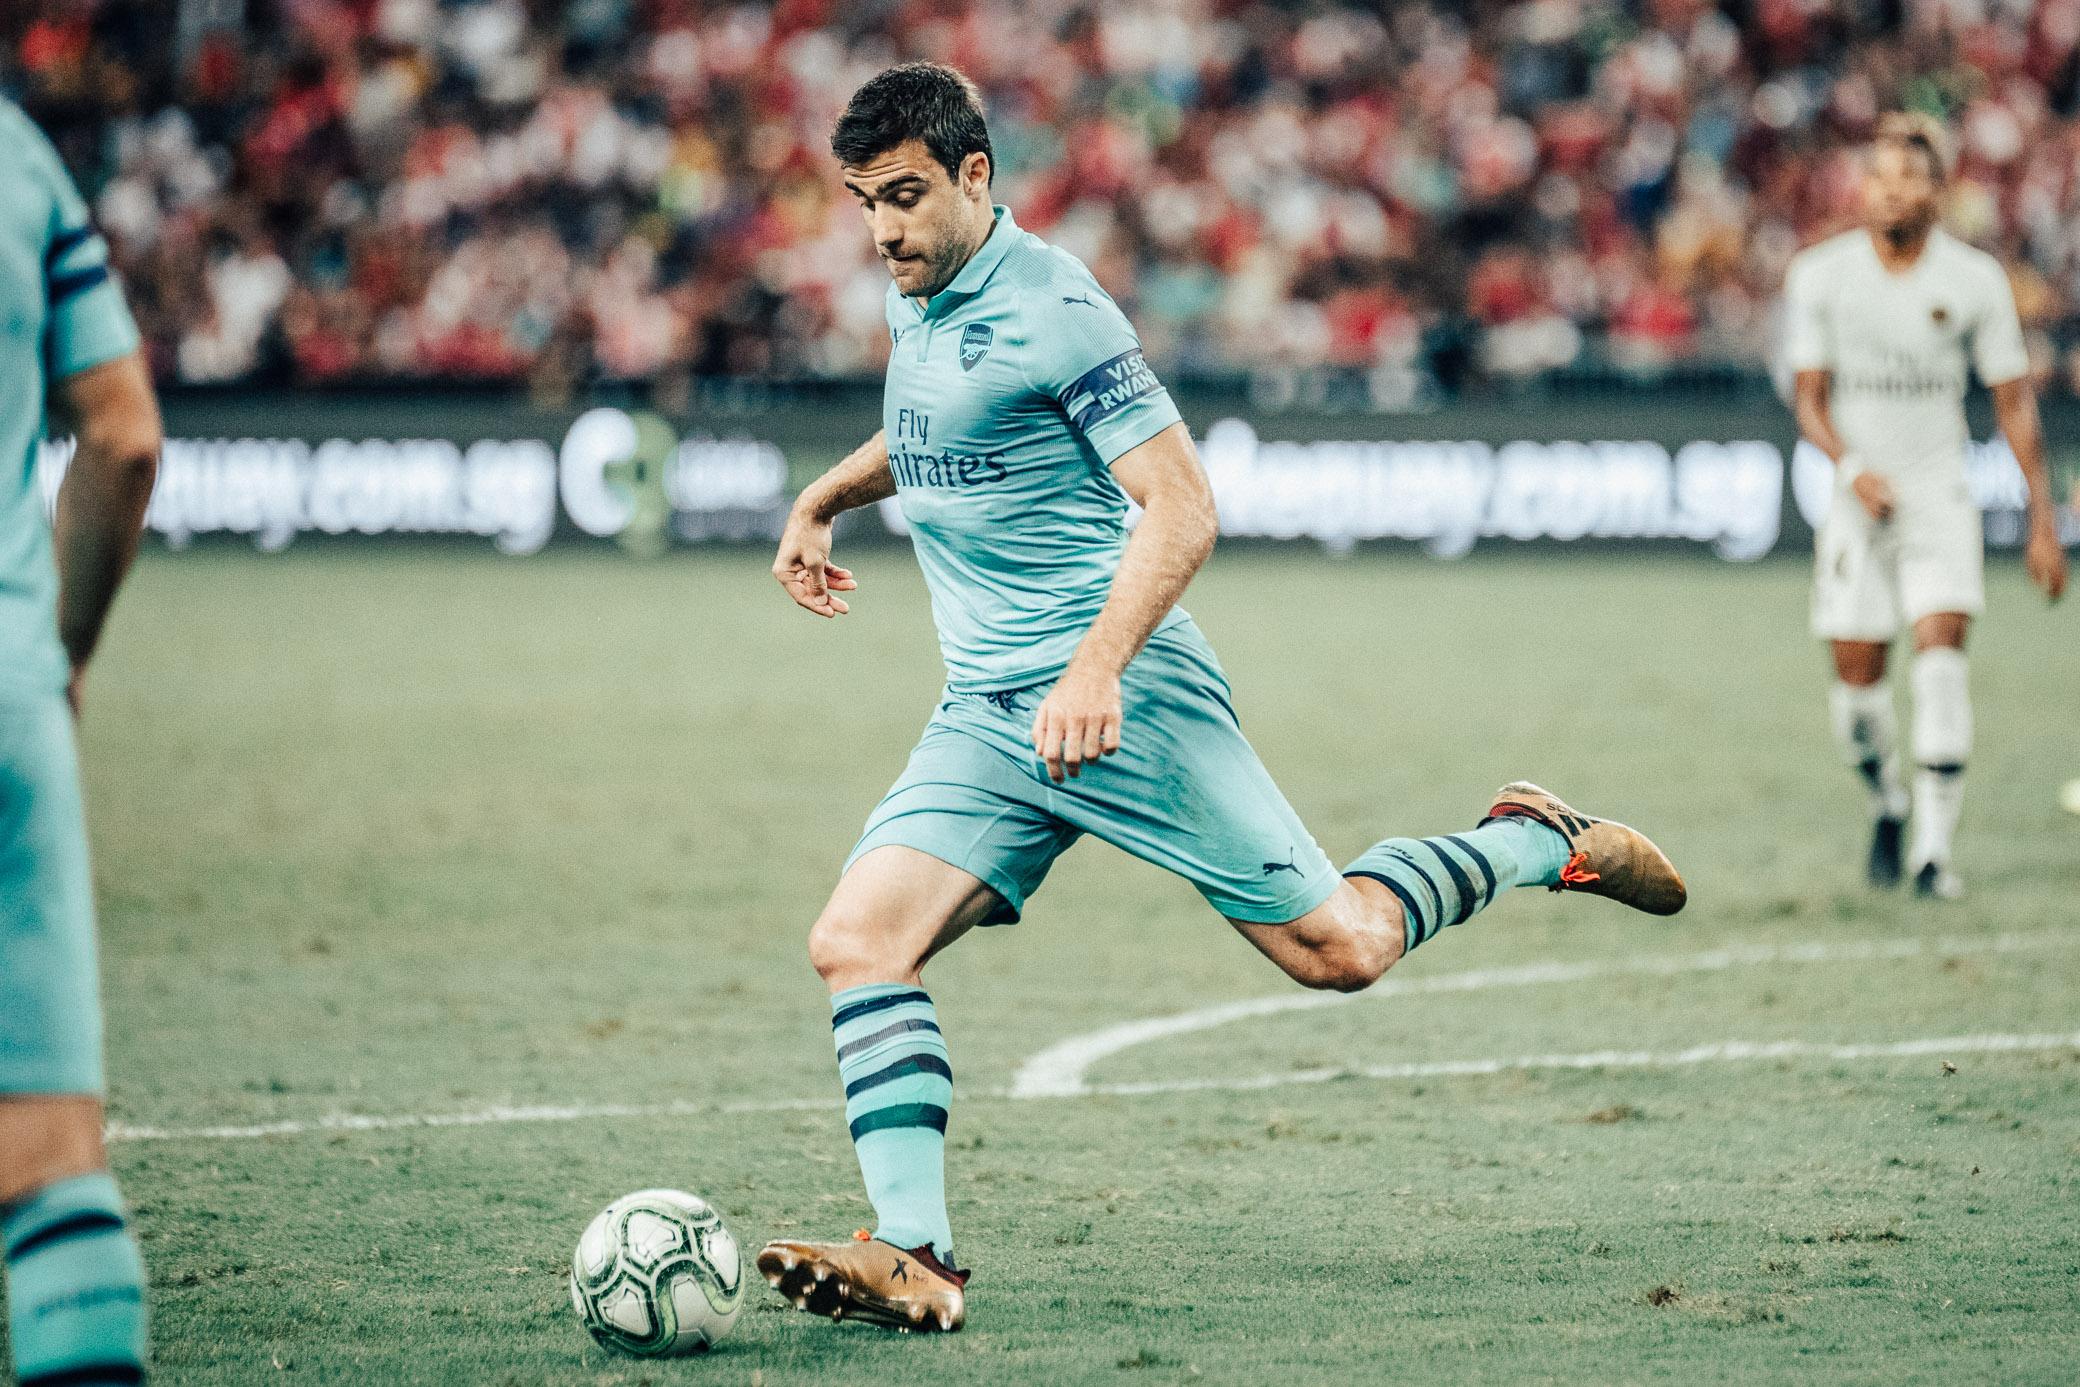 ICC 2018: PSG VS ARSENAL (SOKRATIS)